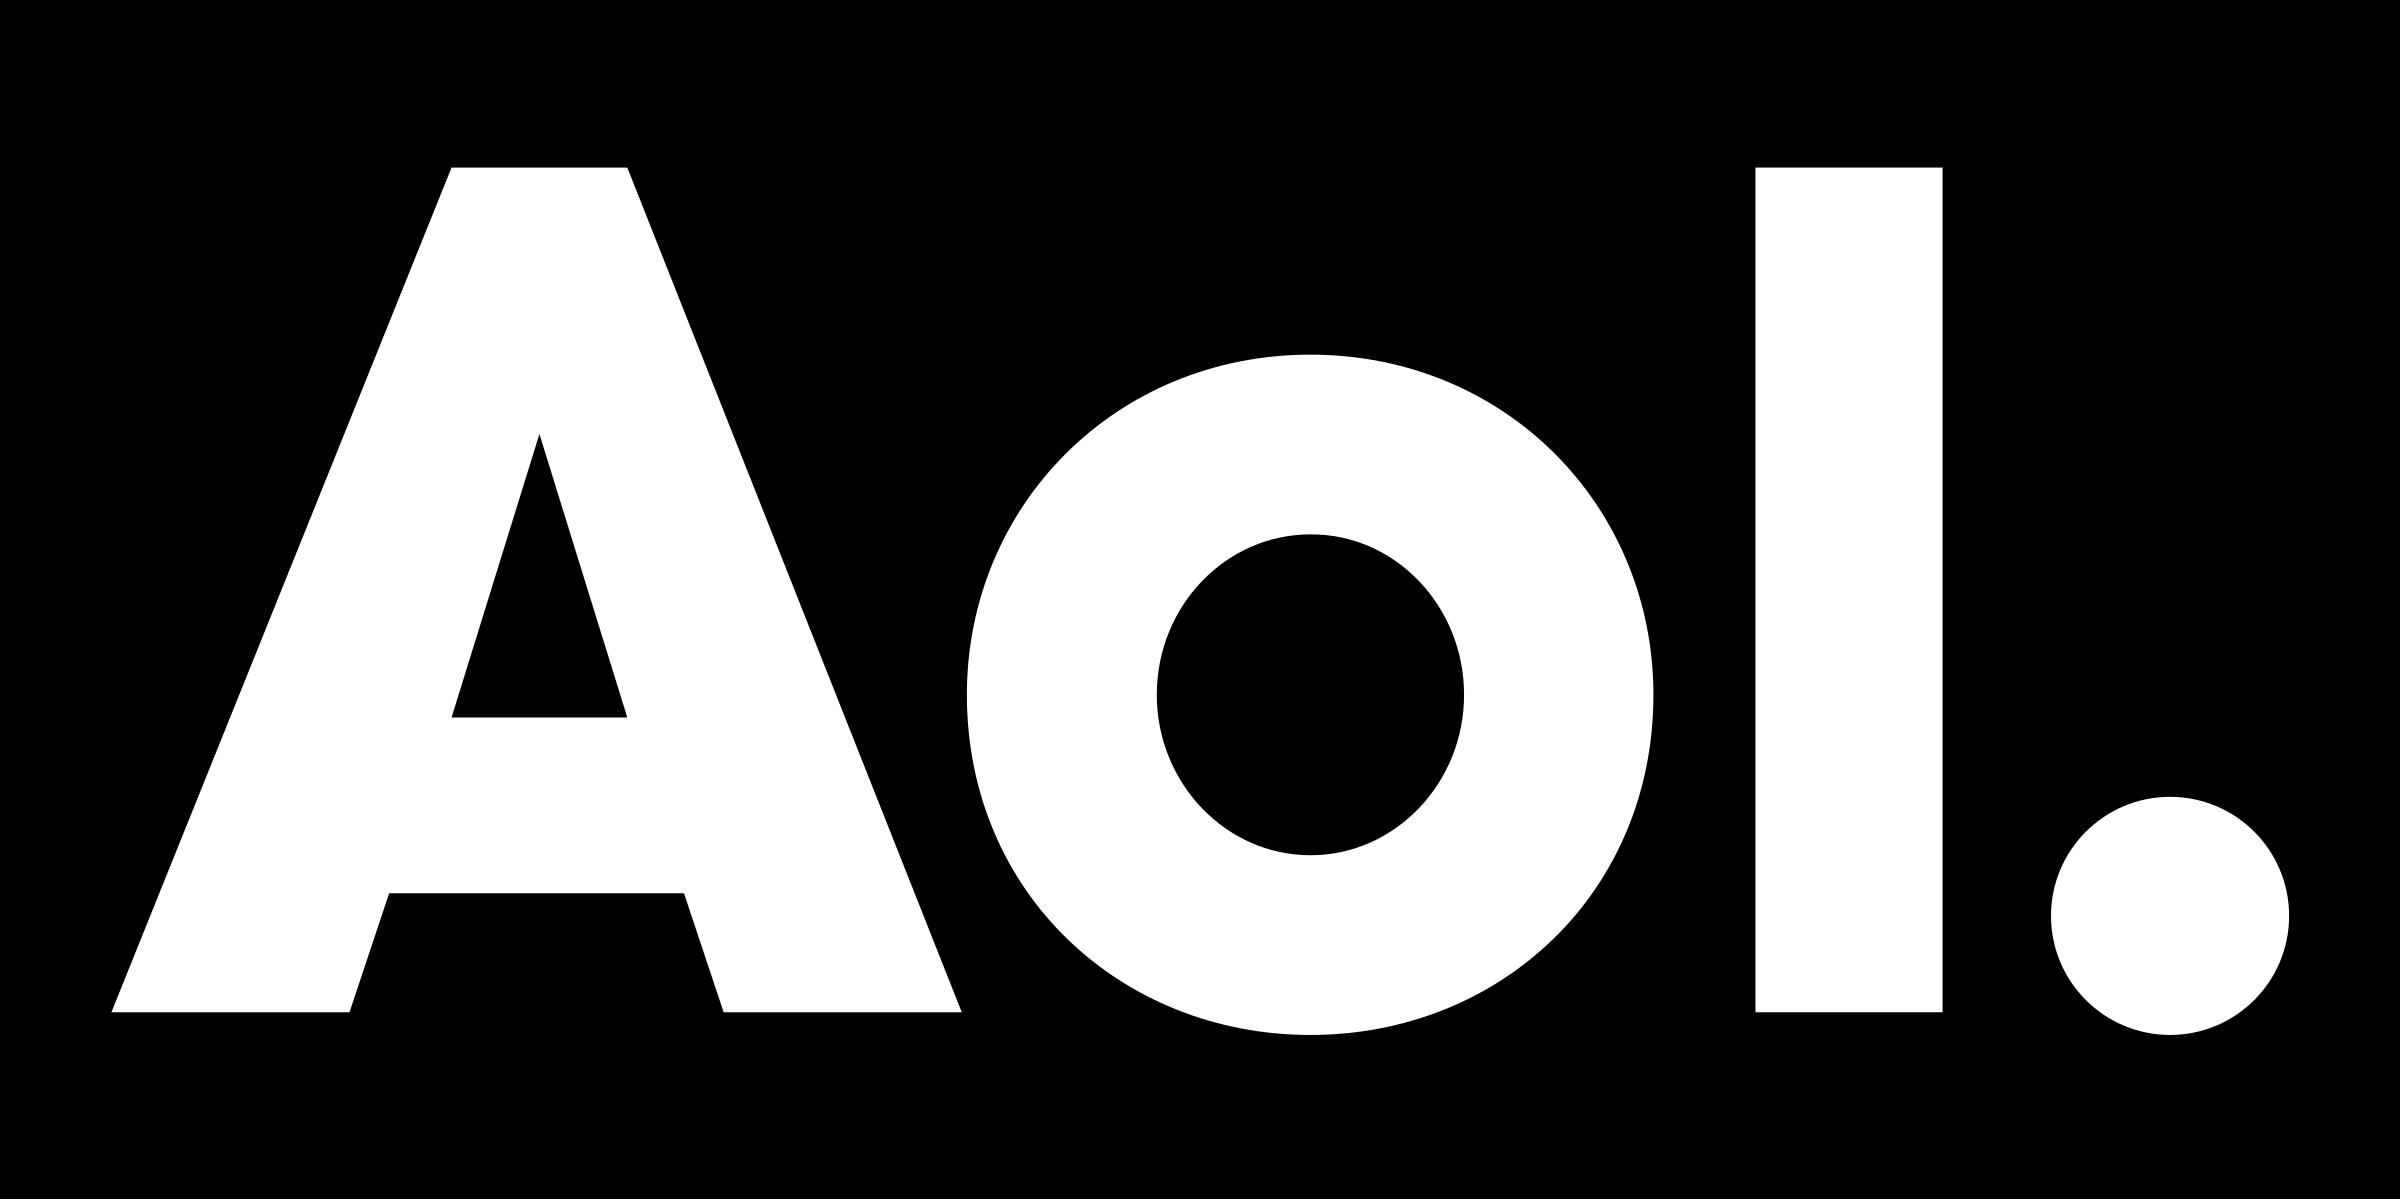 AOL Logo PNG Transparent & SVG Vector - Freebie Supply